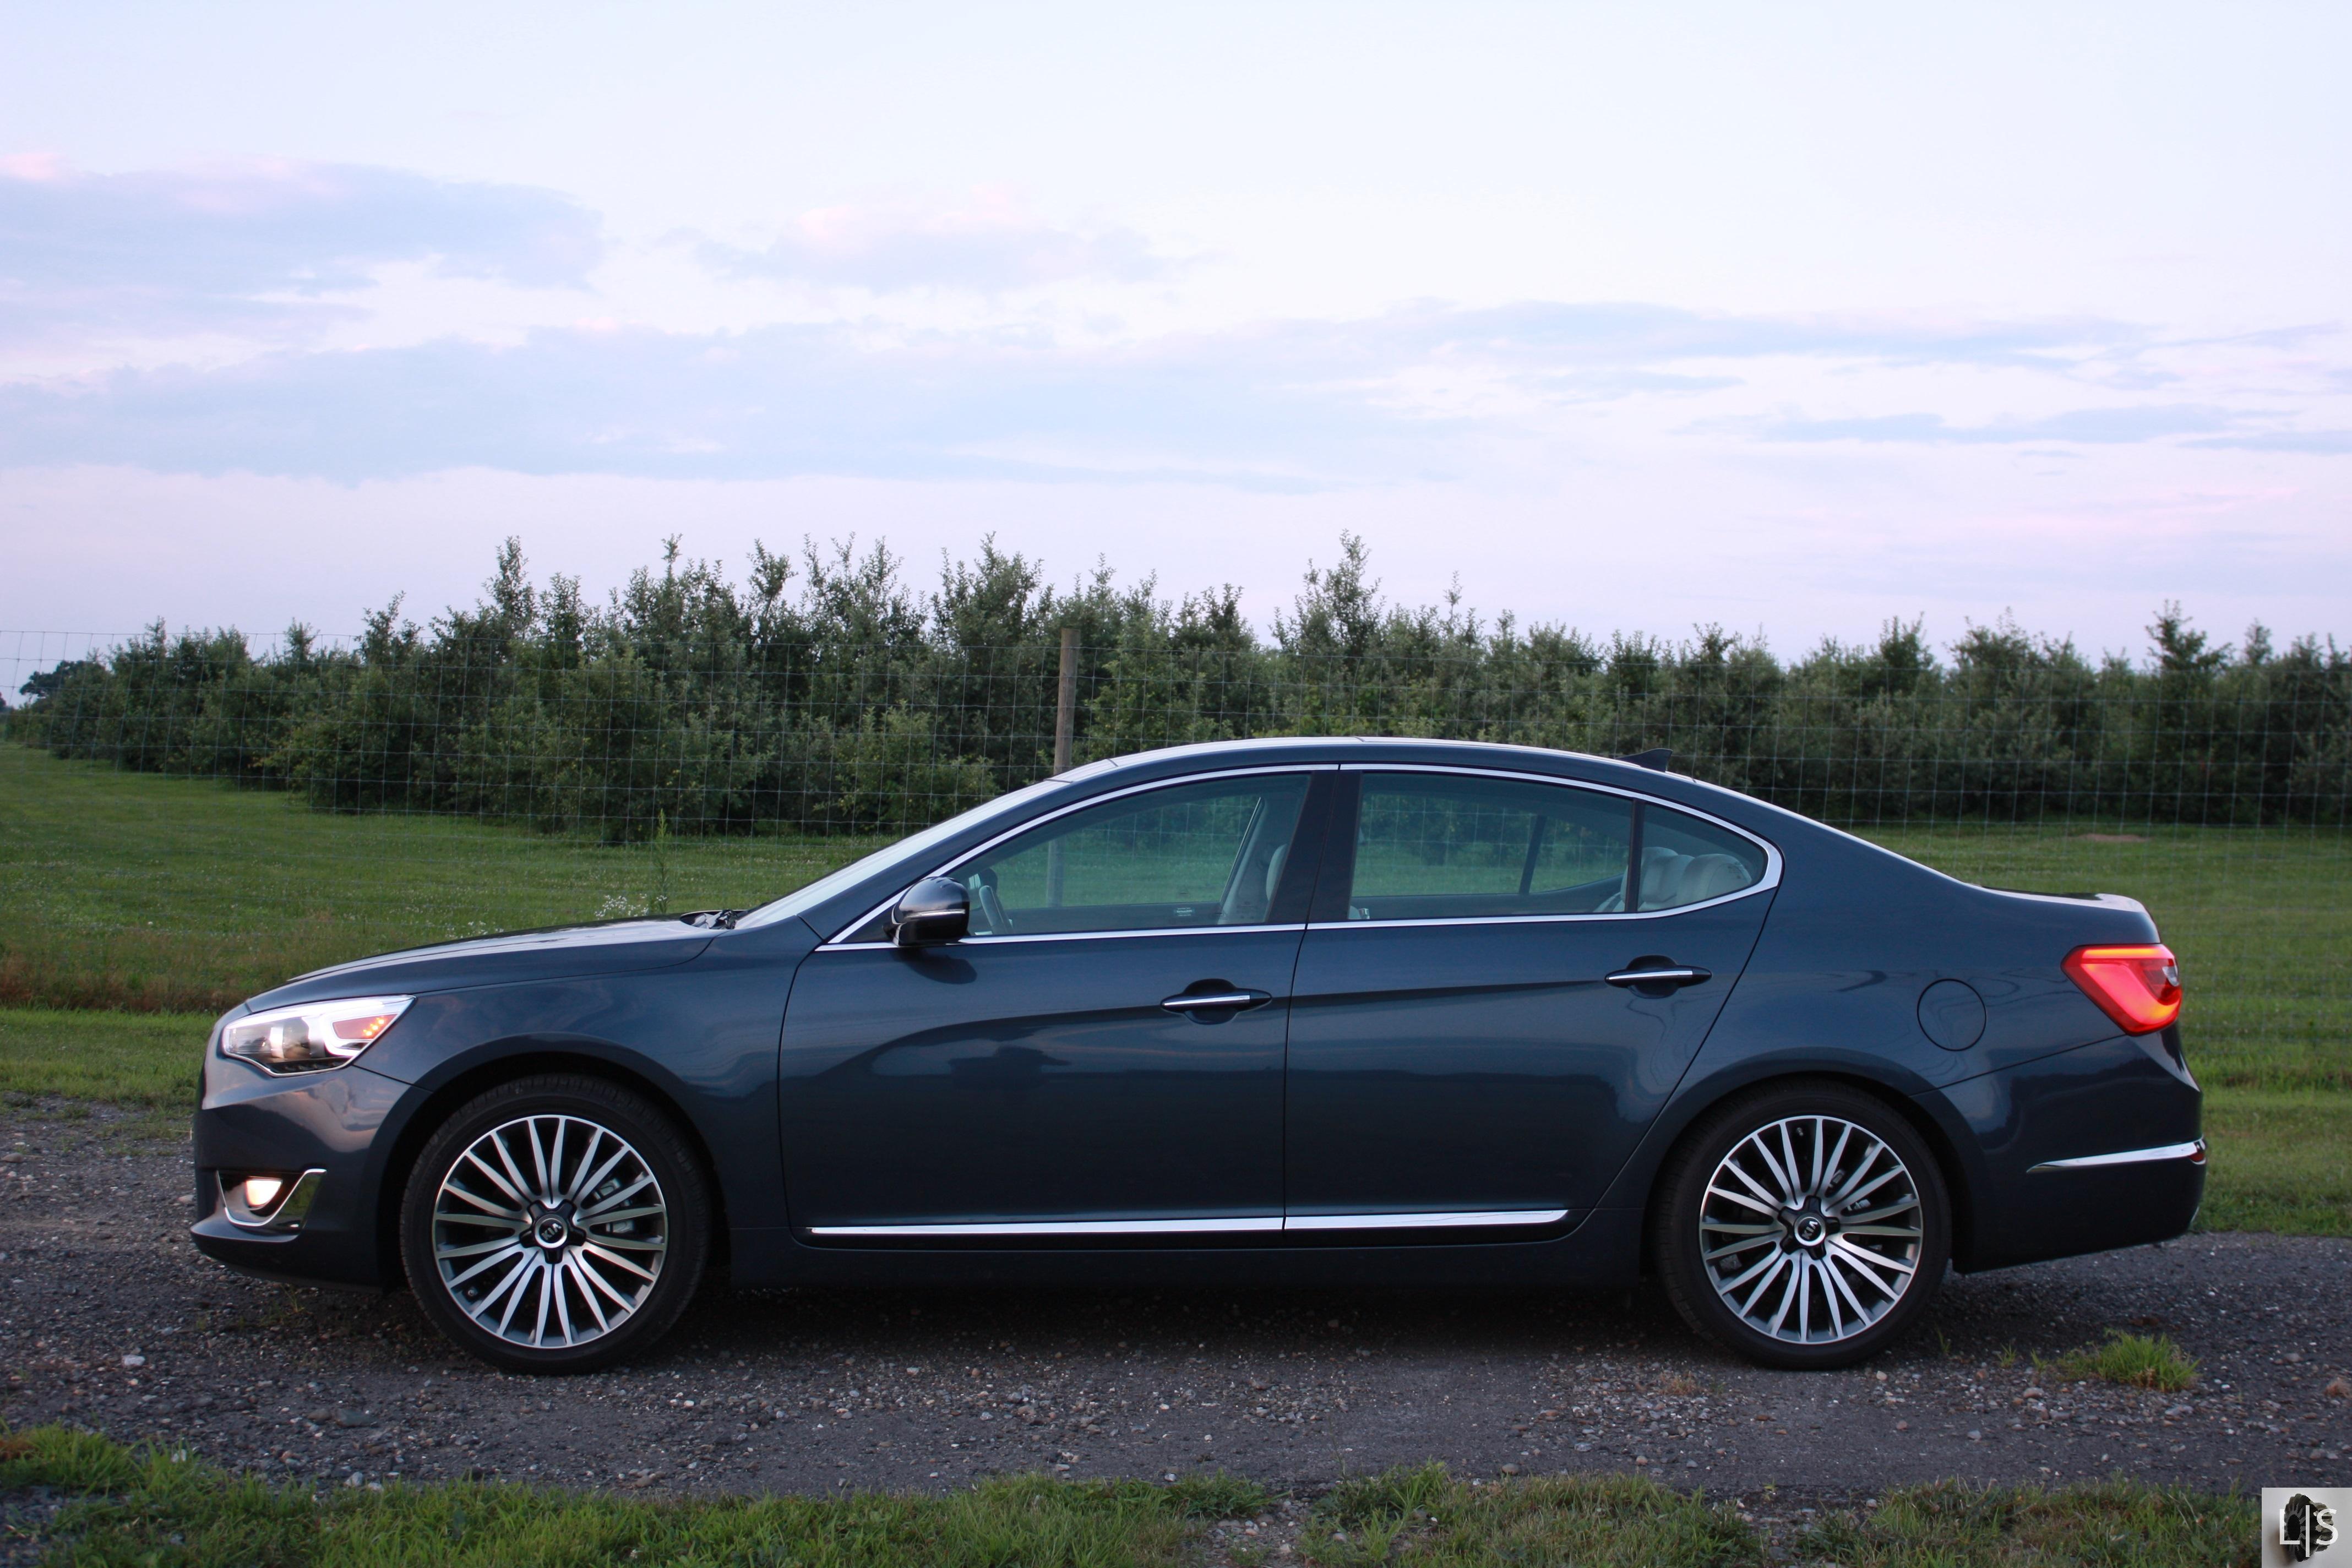 road cadenza kia report test limited clean fleet